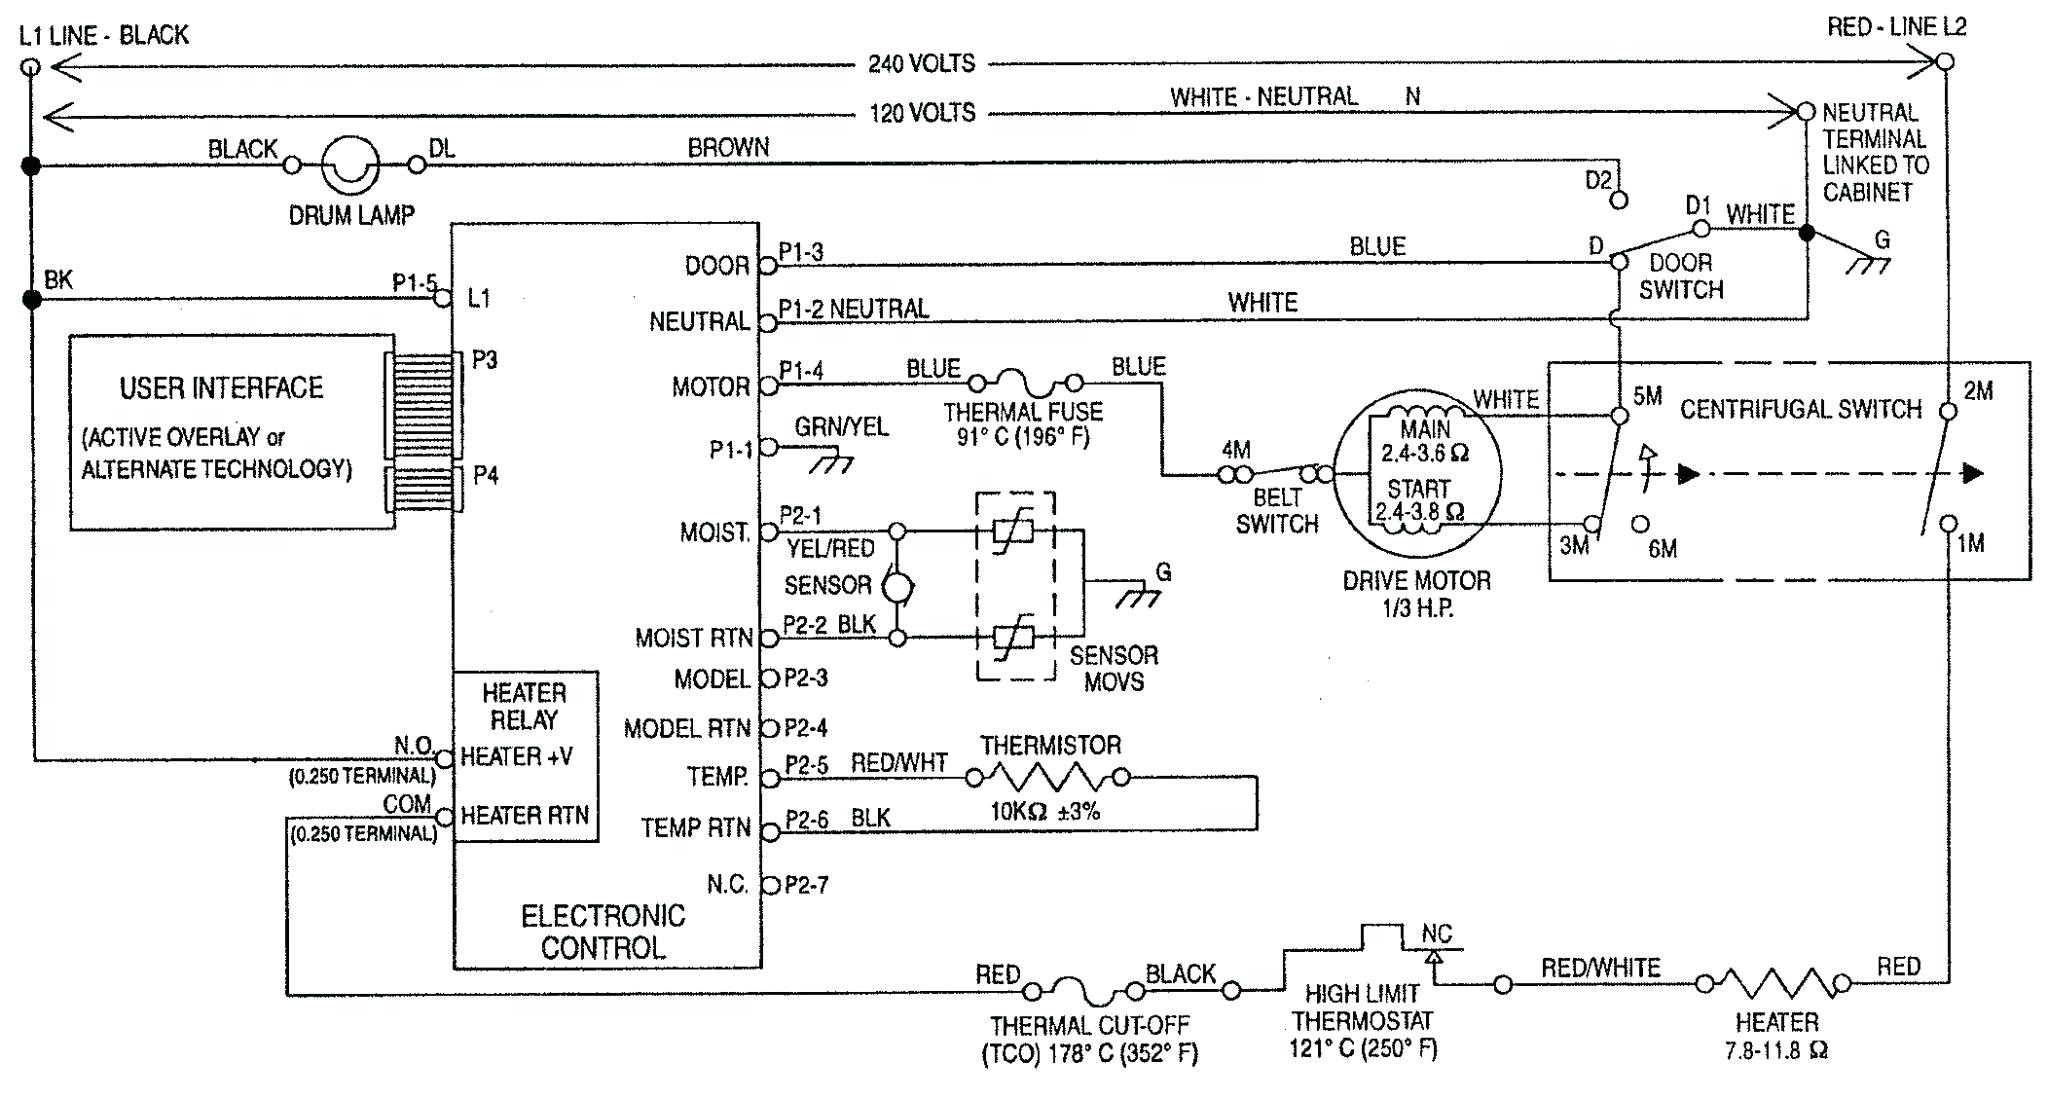 Dryer Wiring Diagram Luxury Ge Motor Agnitum 4 | Hastalavista - Ge Motor Wiring Diagram